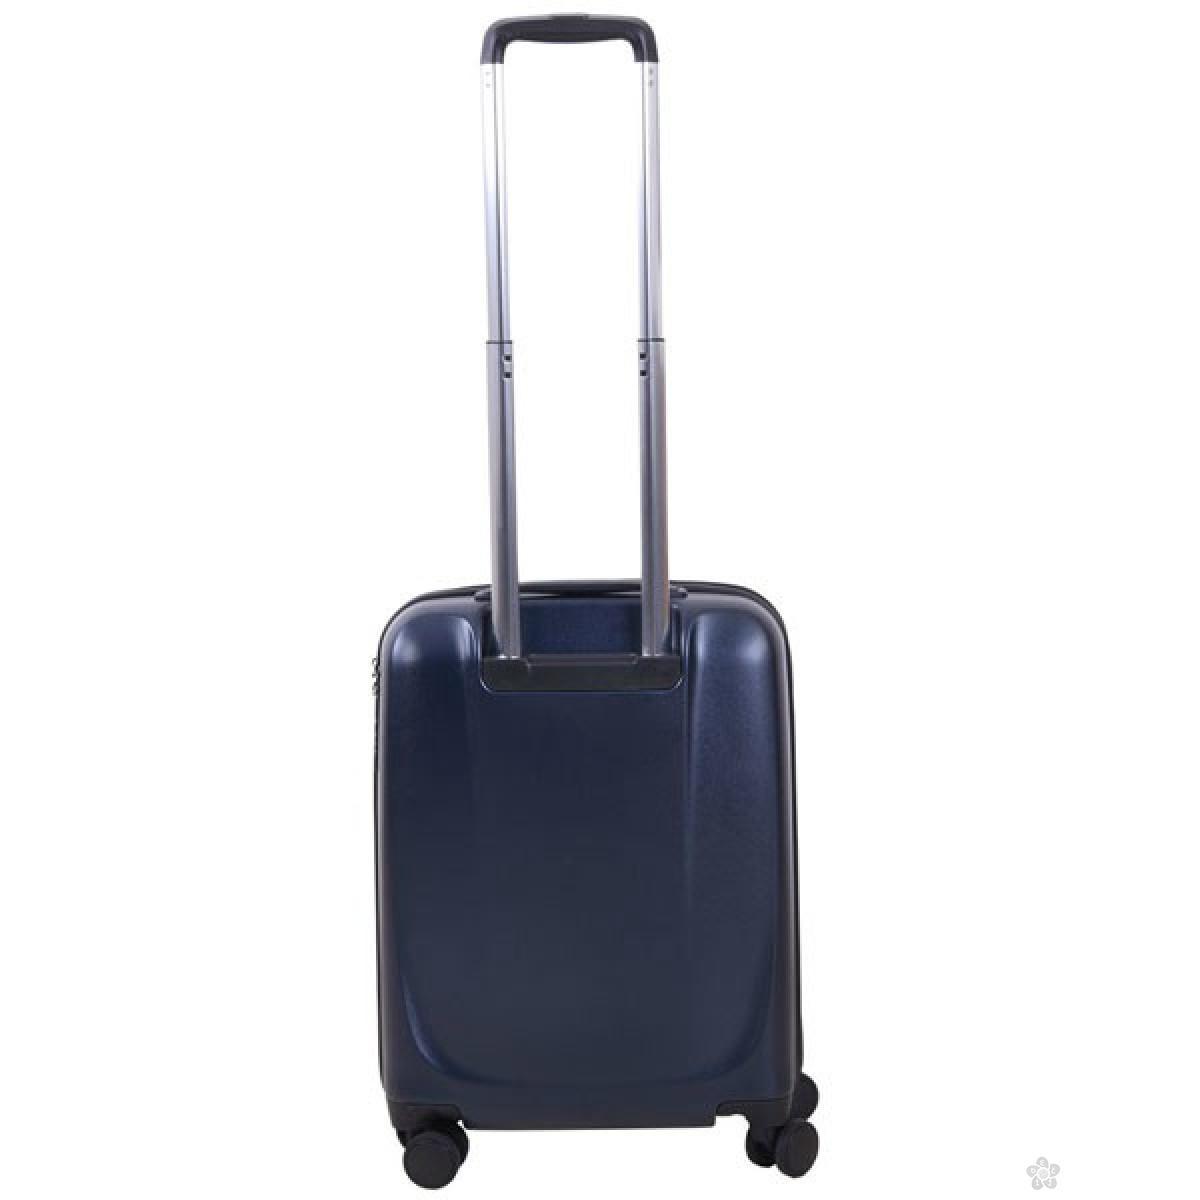 Kofer Pulse Manhattan tamno plavi 20inch X21154